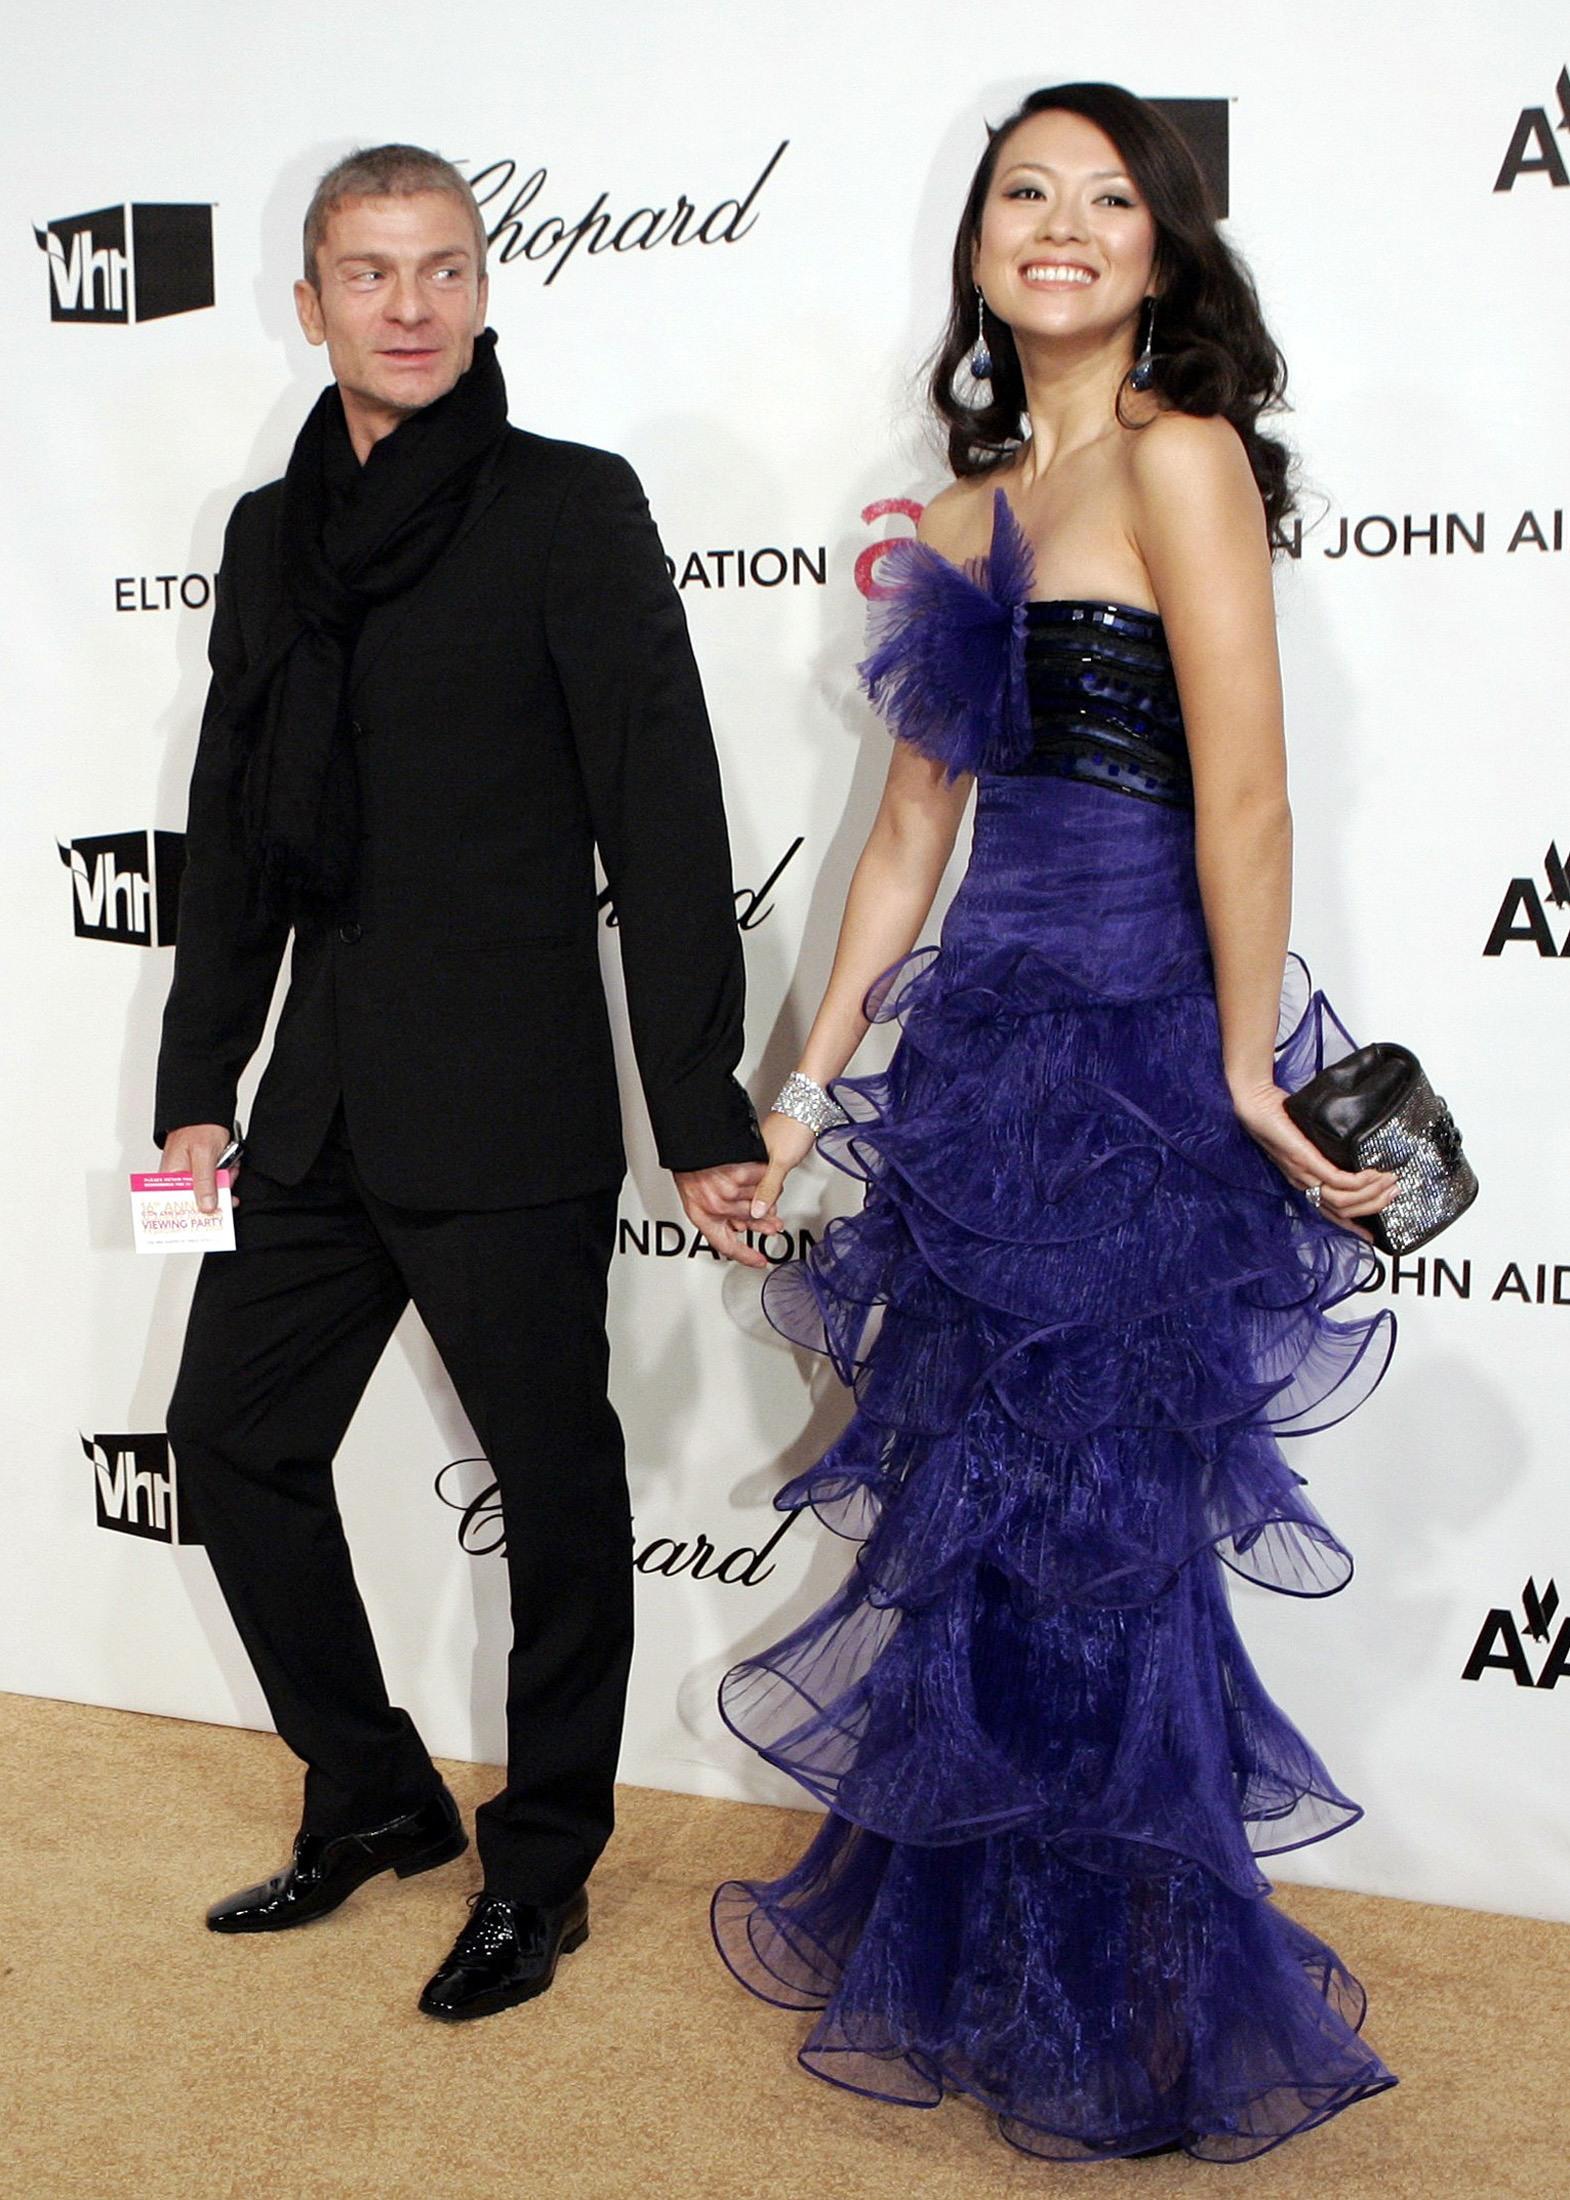 Zhang Ziyi and Vivi Nevo pose at Annual Elton John AIDS Foundation